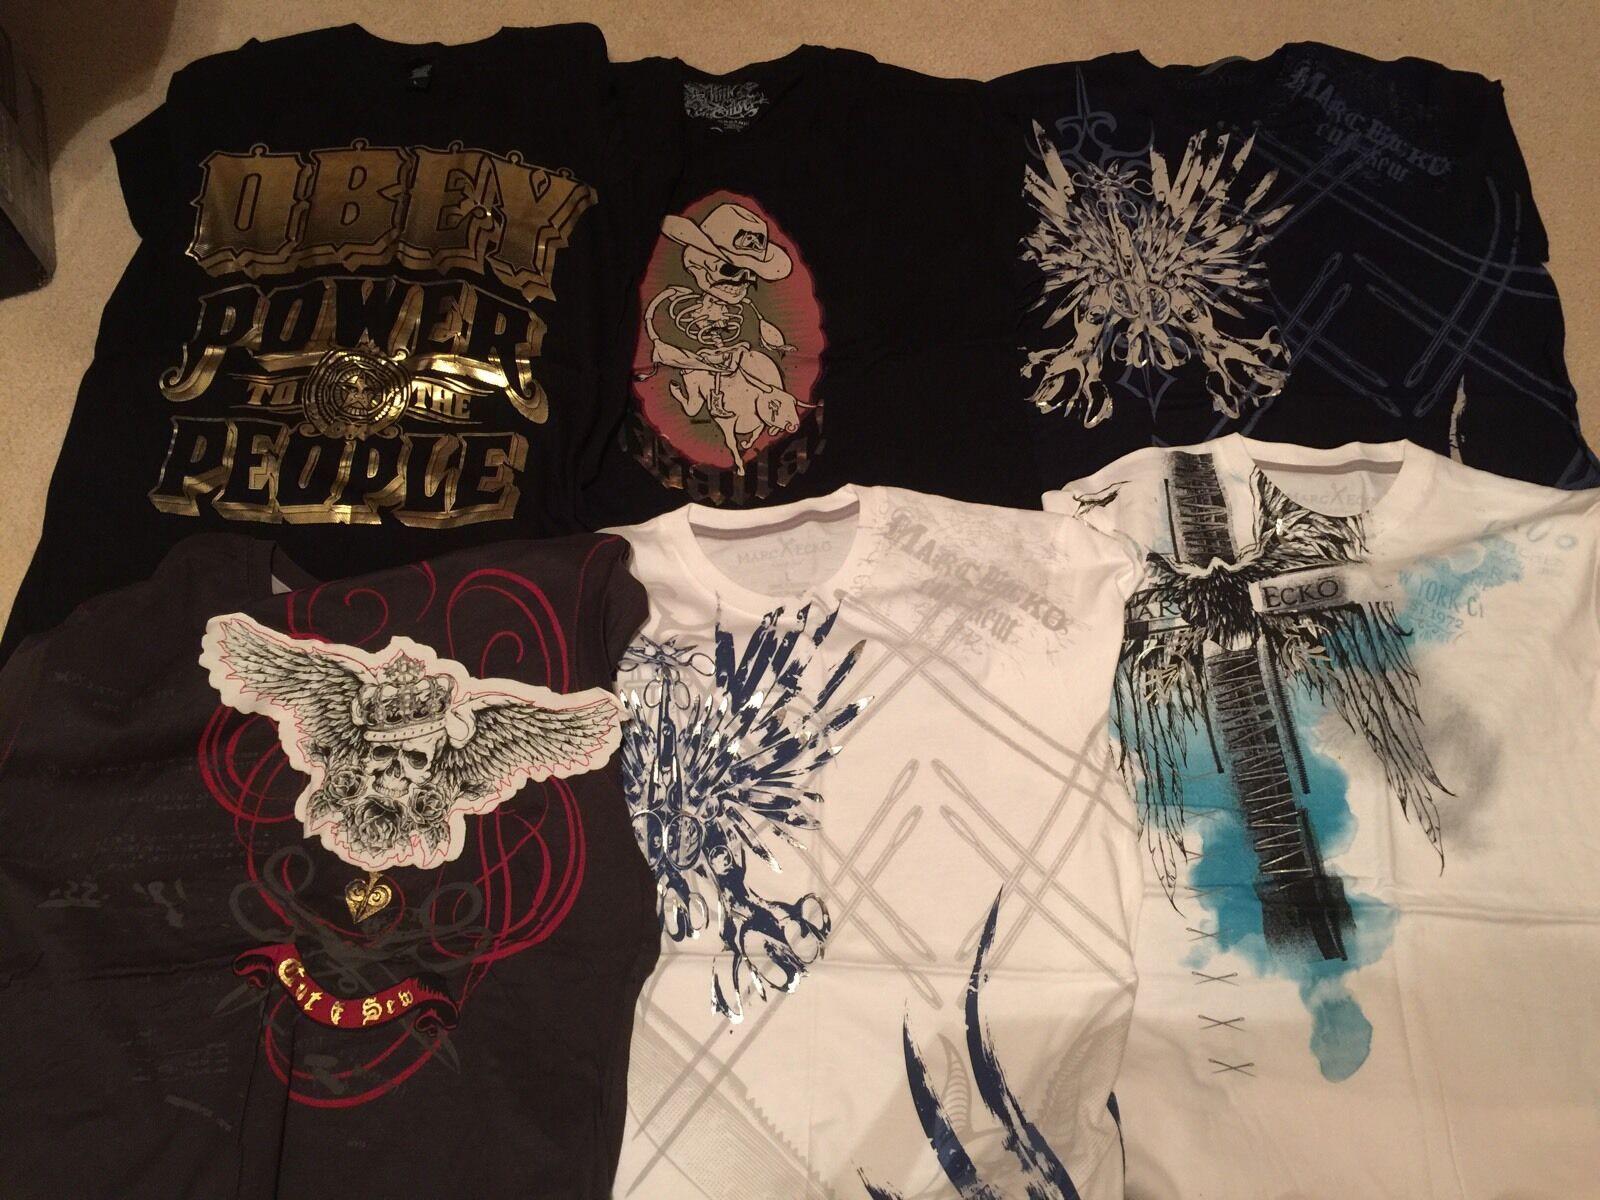 11 Graphic Tee Shirts Sz Large Ecko Cut & Sew, Pristine Condition